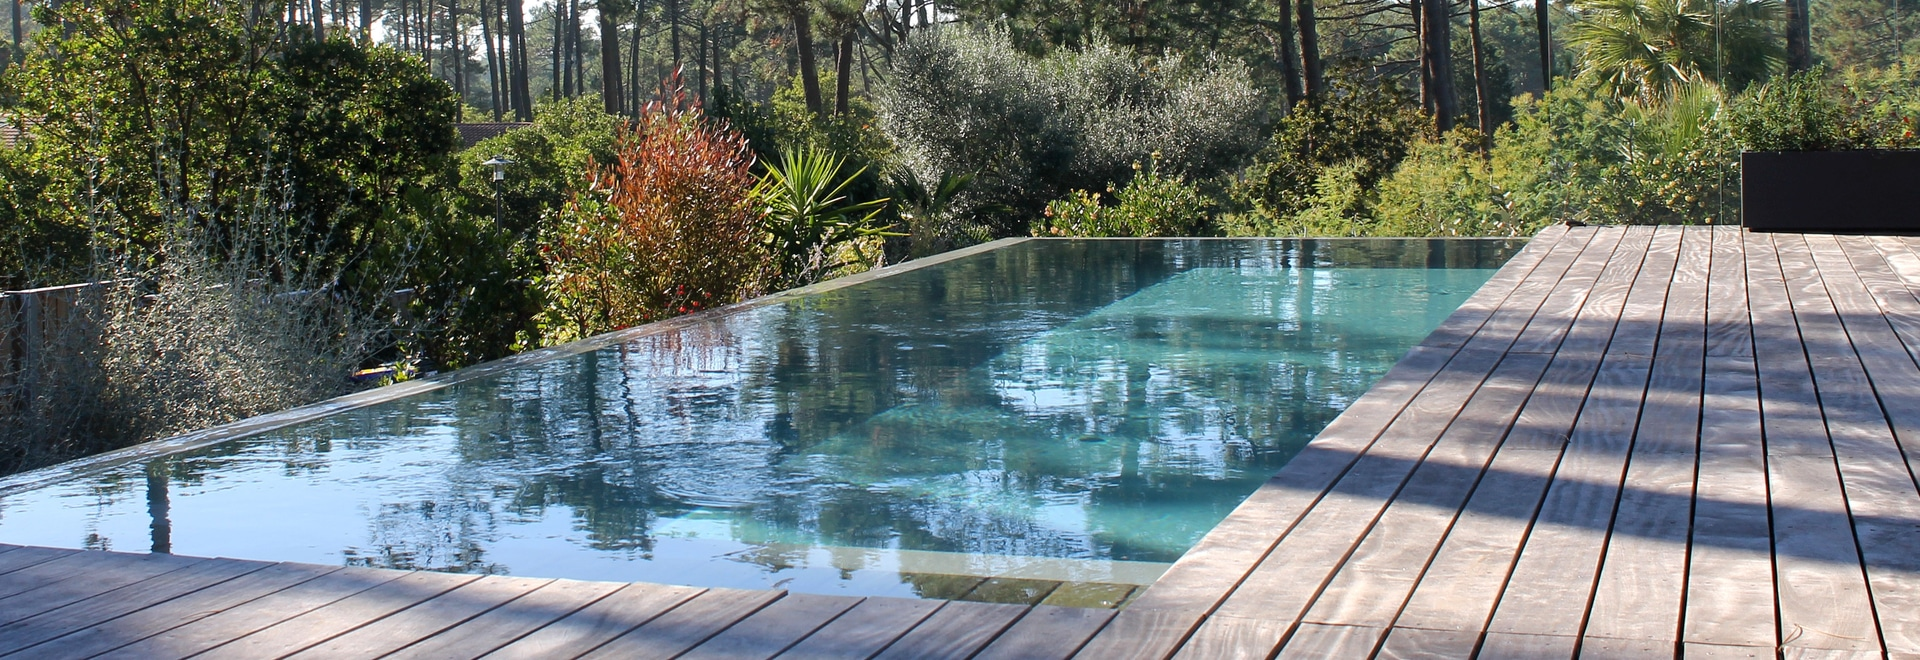 Overflowing swimming pool